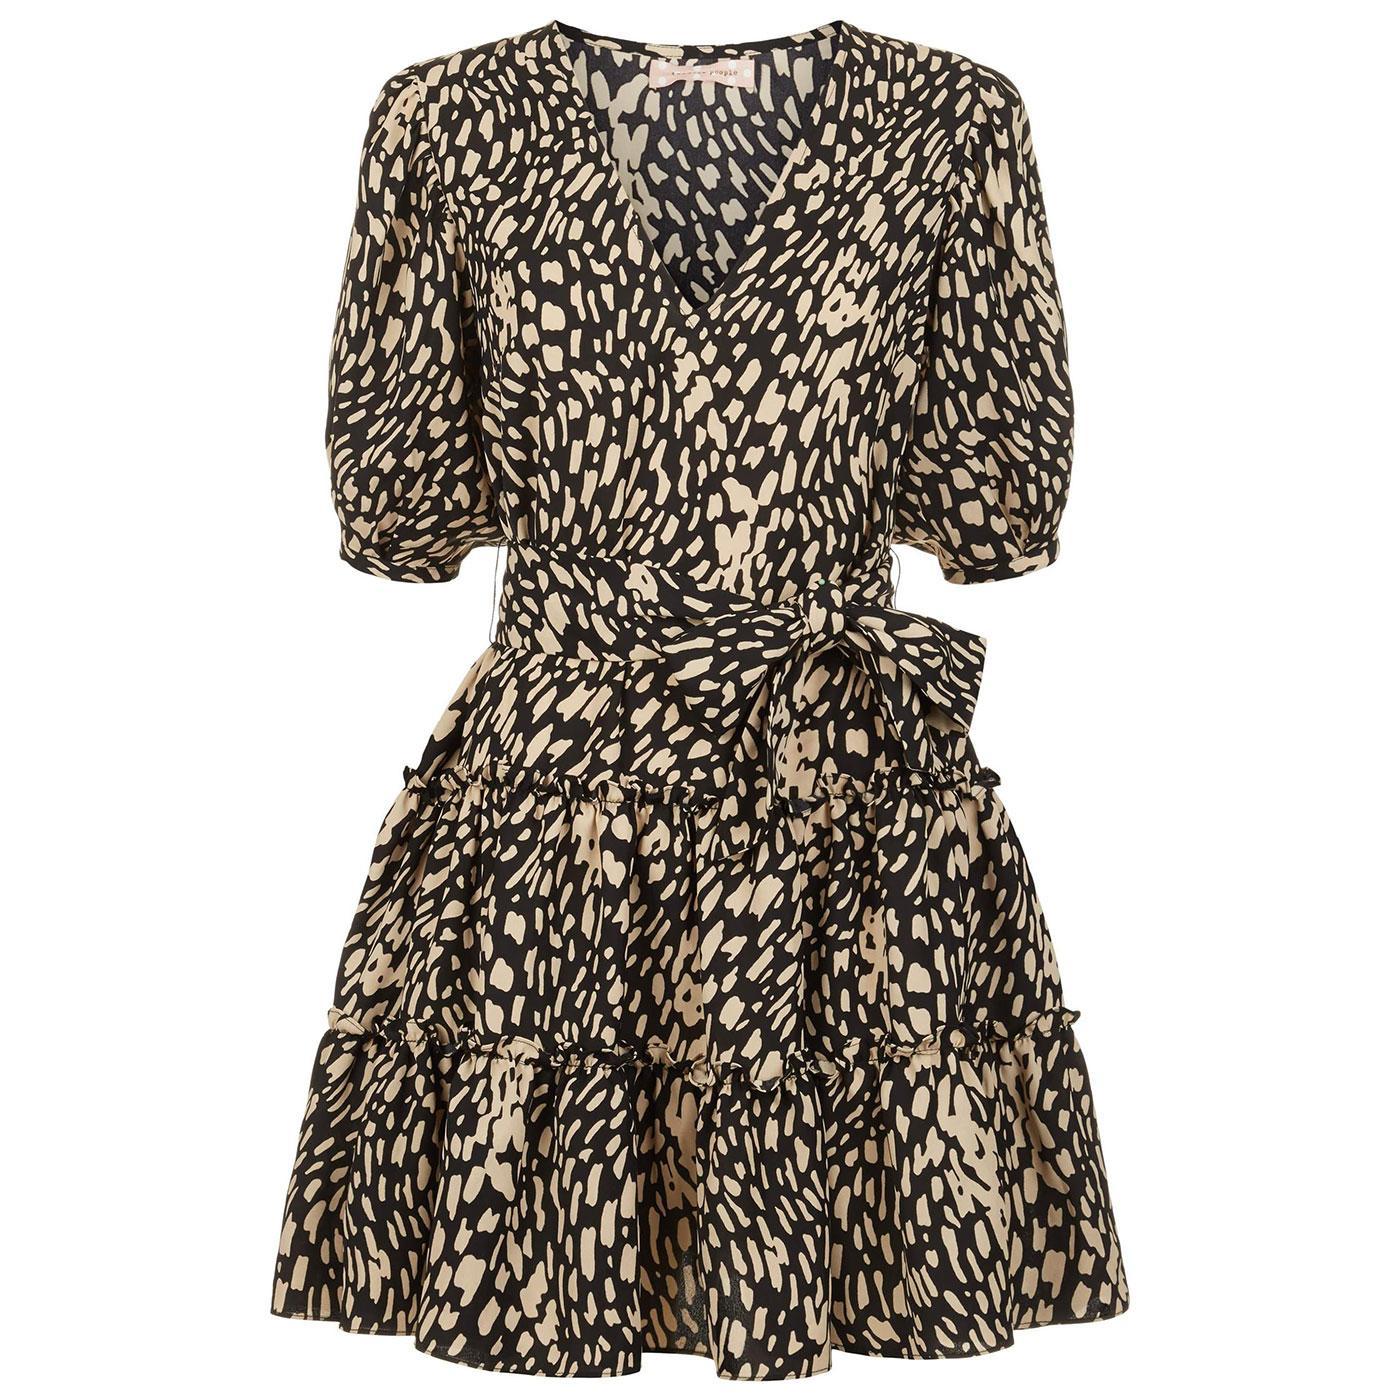 Felicitous TRAFFIC PEOPLE Polka Dot Mini Dress